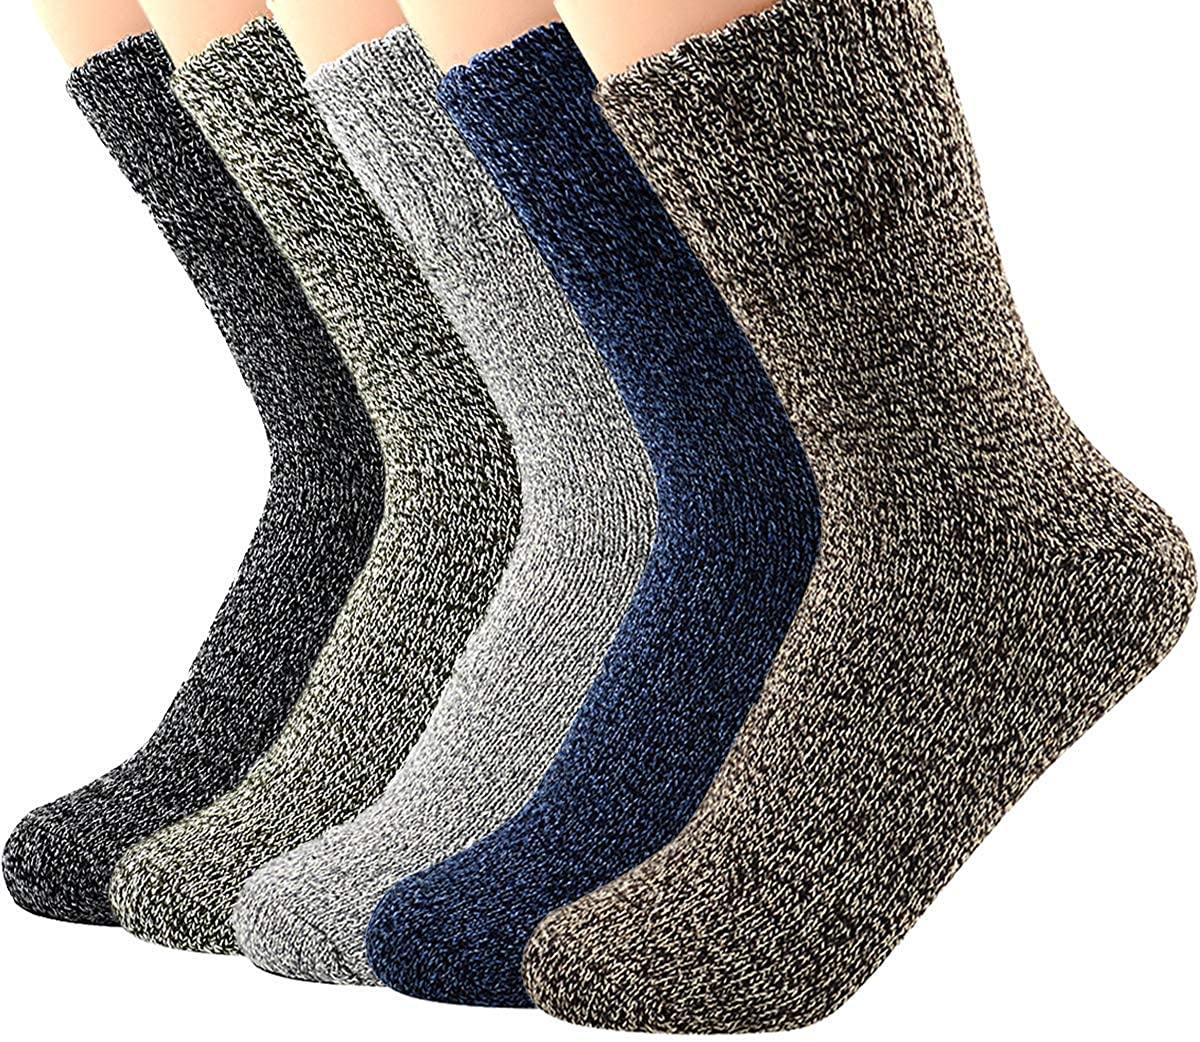 Century Star Womens Vintage Winter Soft Wool Warm Comfort Cozy Crew Socks 5 Pack